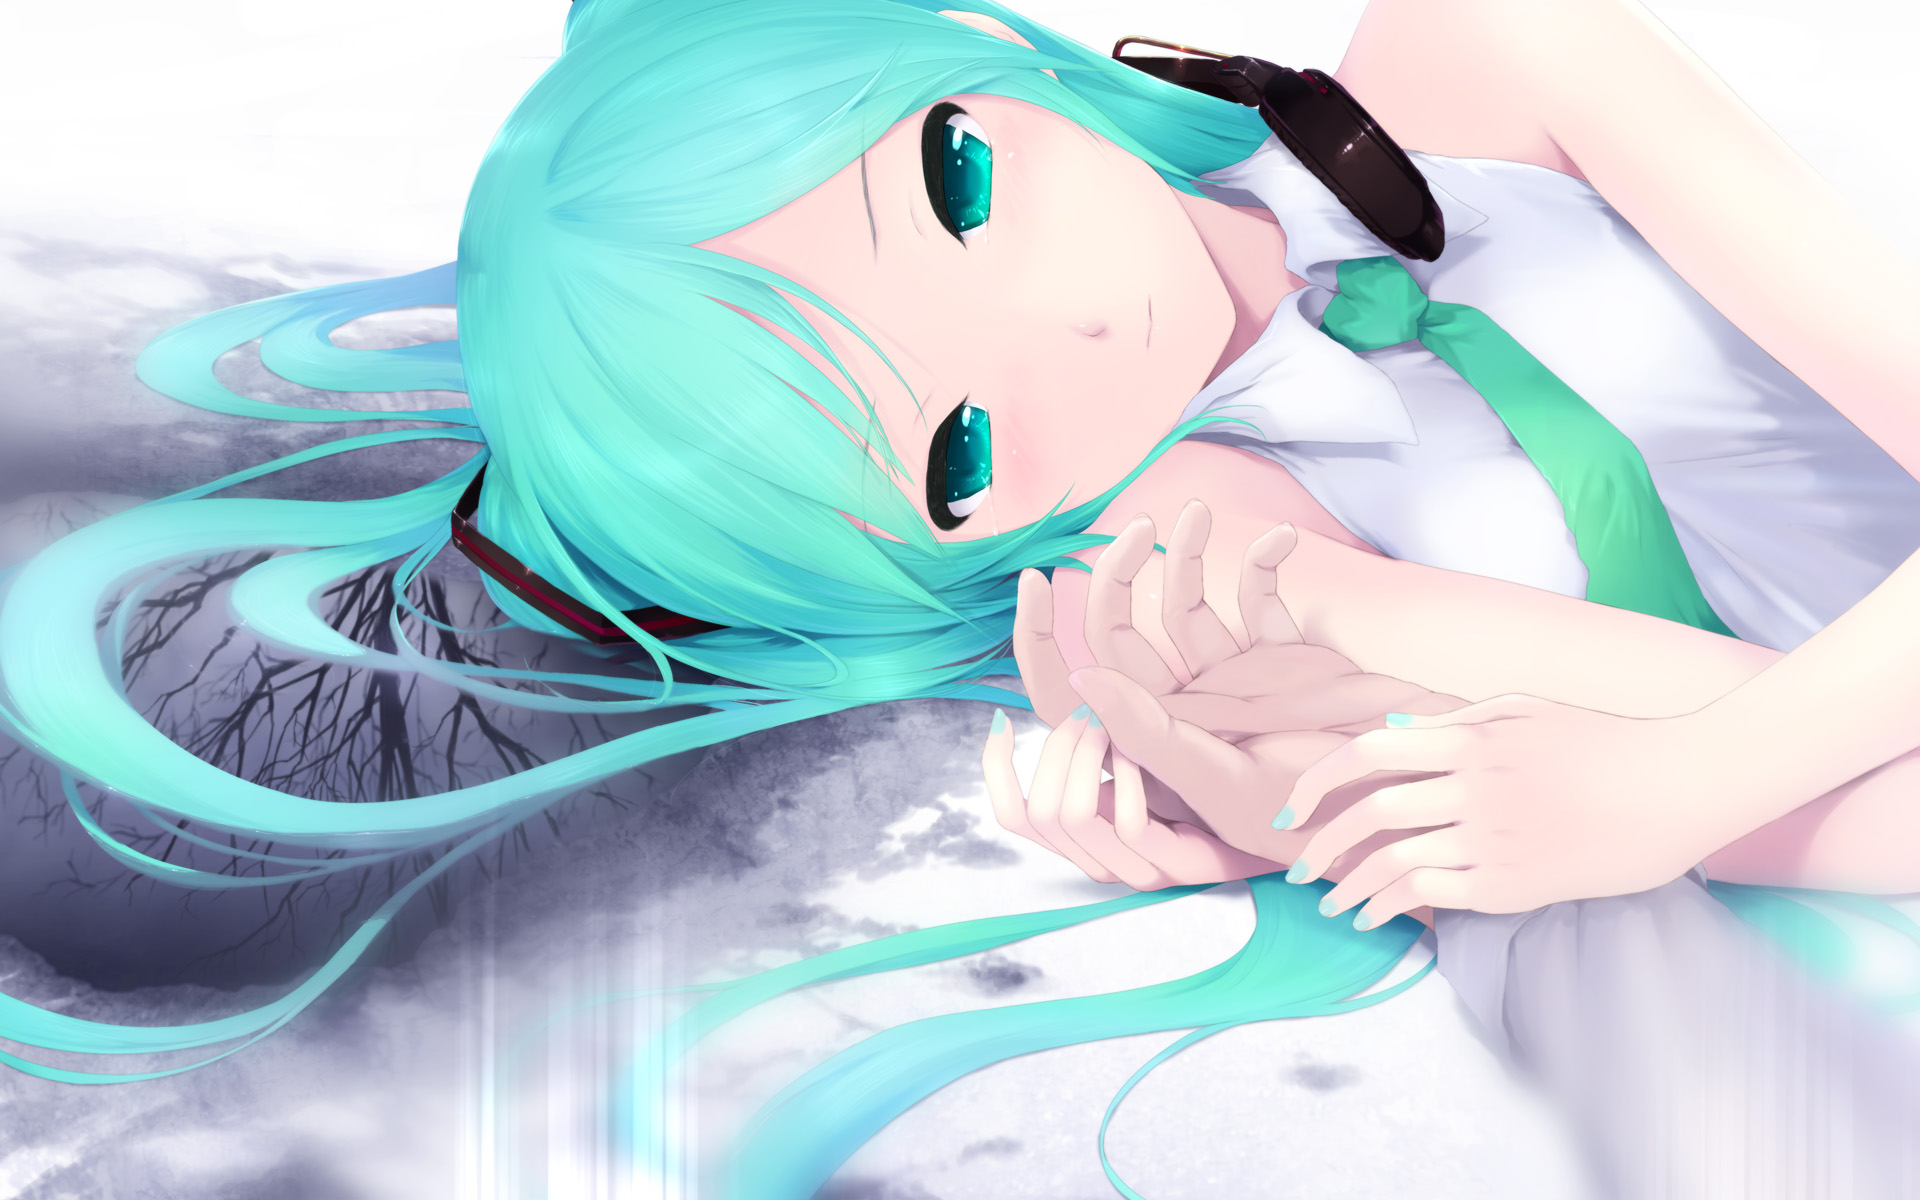 Anime - Vocaloid  Hatsune Miku Anime Wallpaper